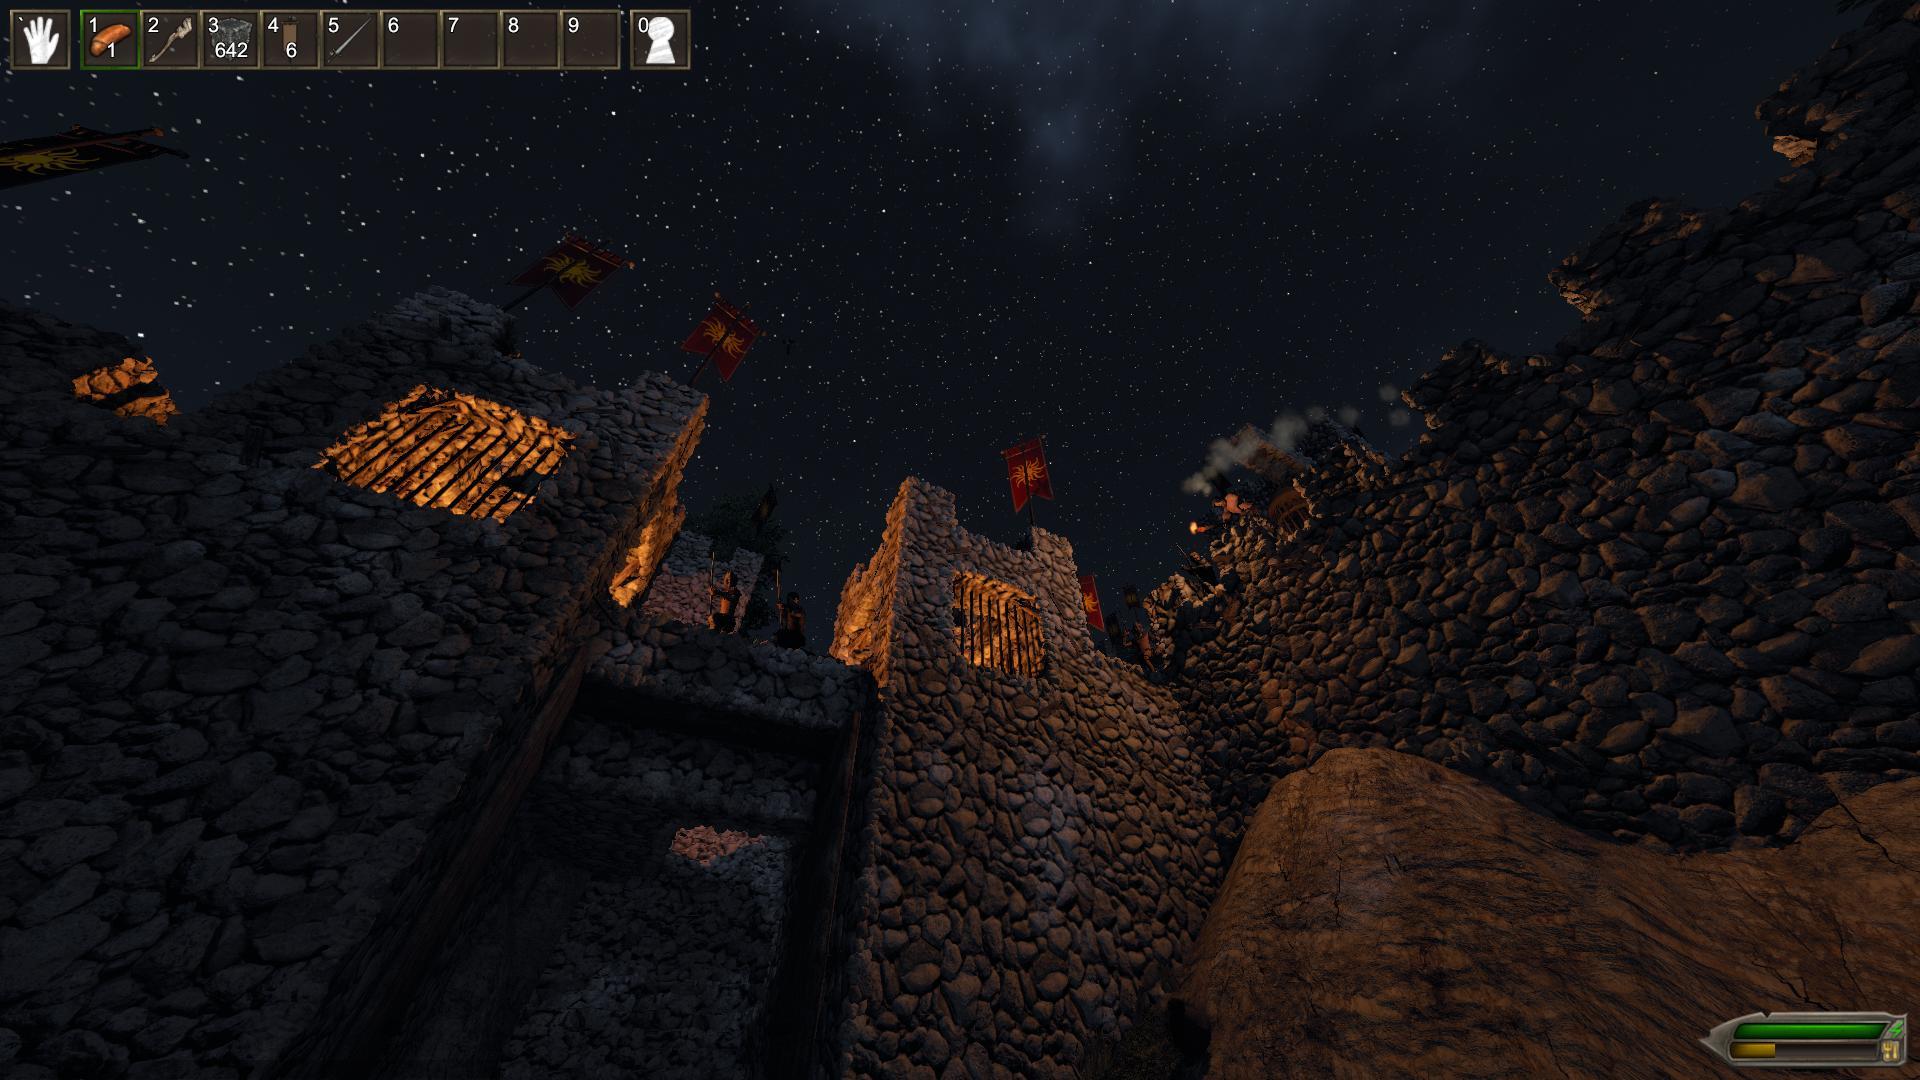 Reign of Kings 2 - دانلود بازی آنلاین Reign of Kings برای کامپیوتر